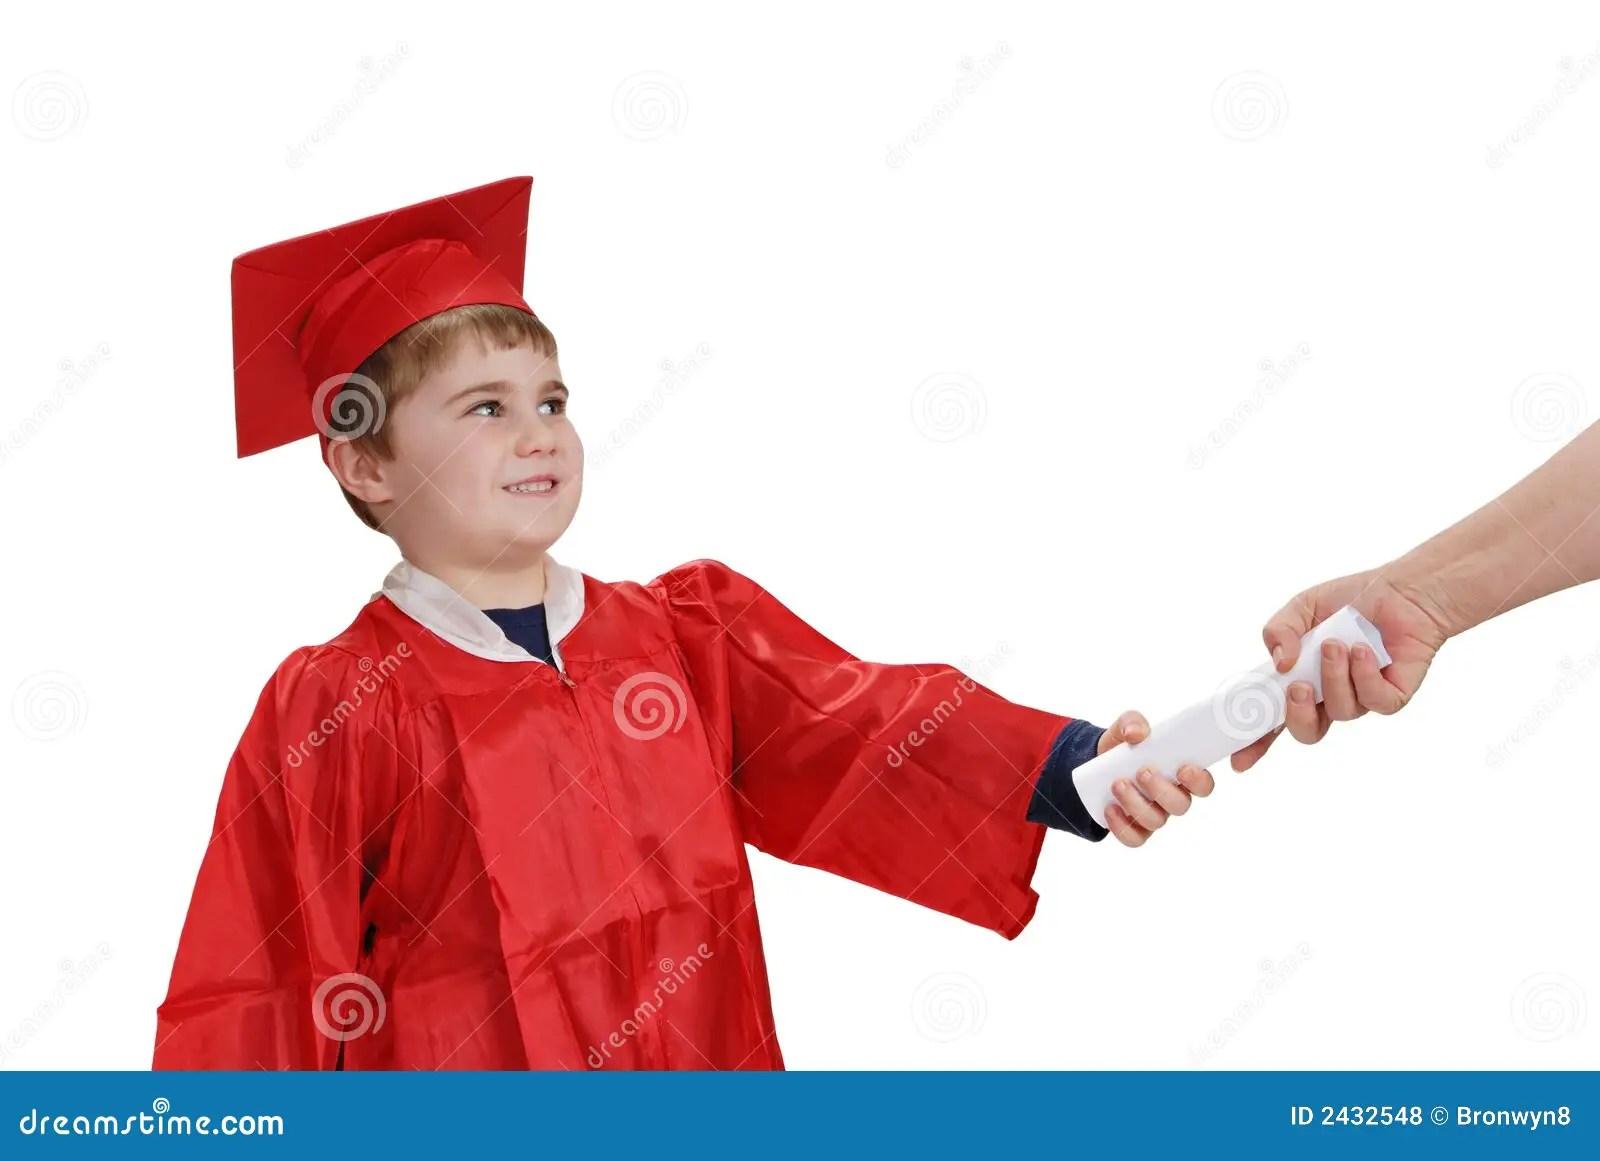 Graduation Day Royalty Free Stock Photos Image 2432548